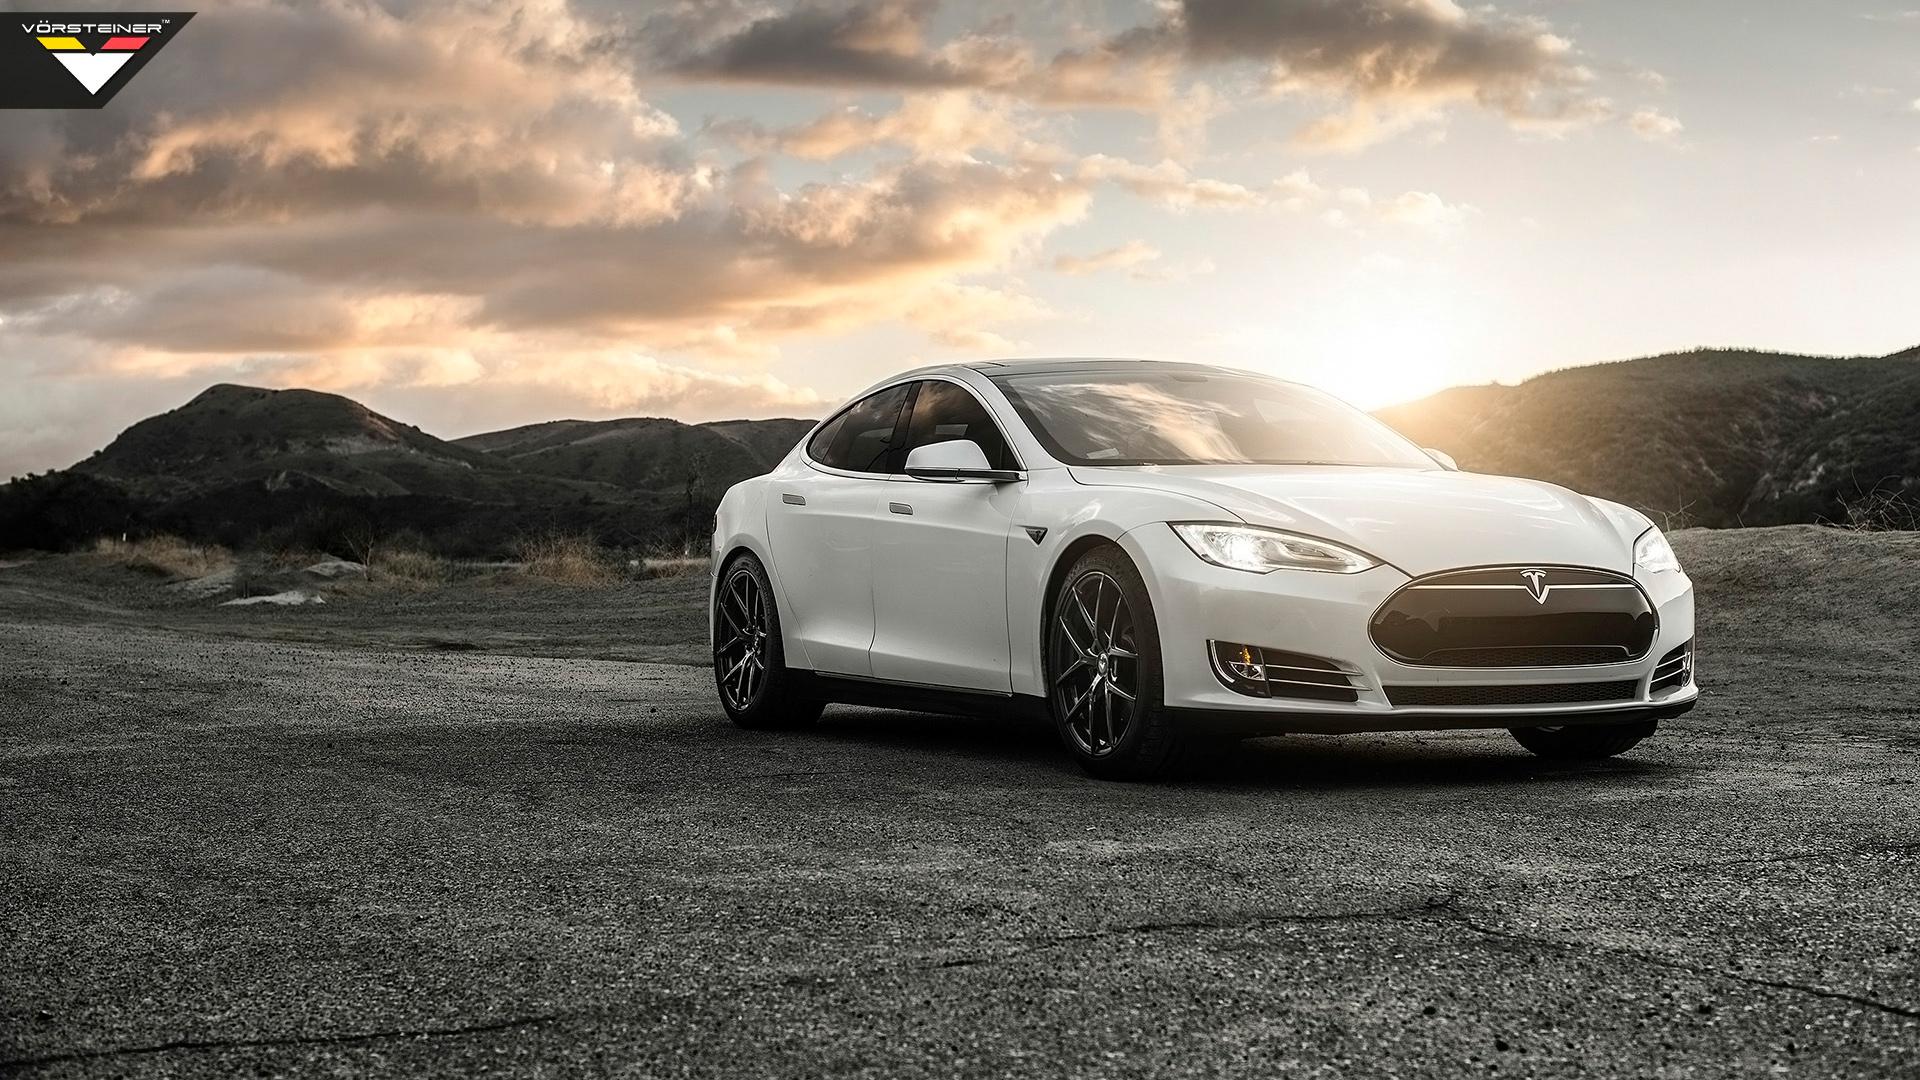 2014 Vorsteiner Tesla Model S P85 Wallpaper Hd Car